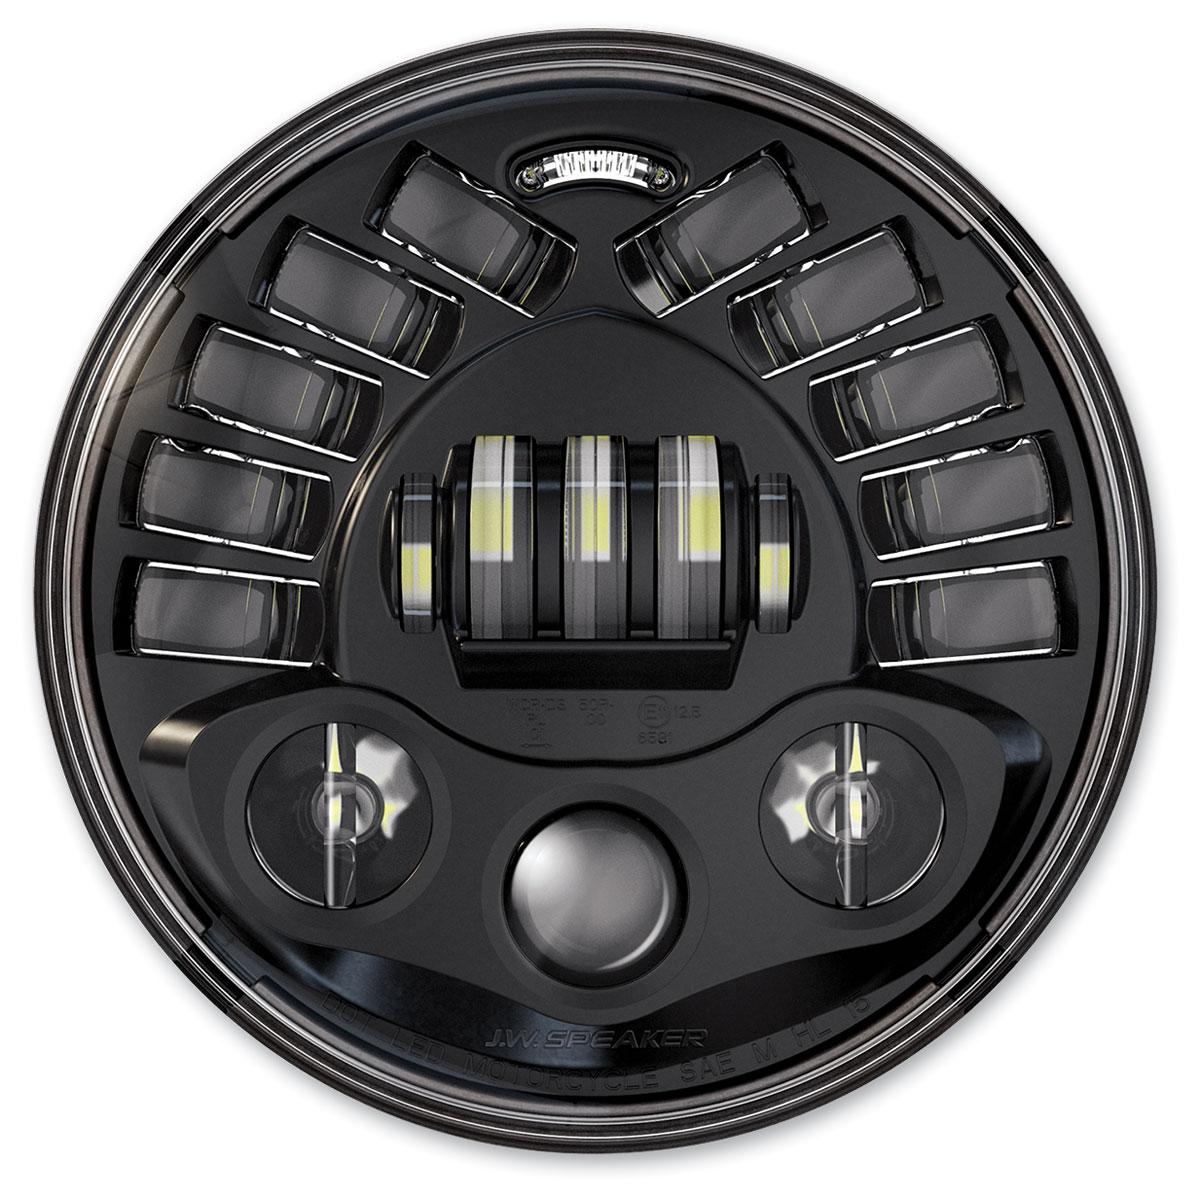 J.W. Speaker 7